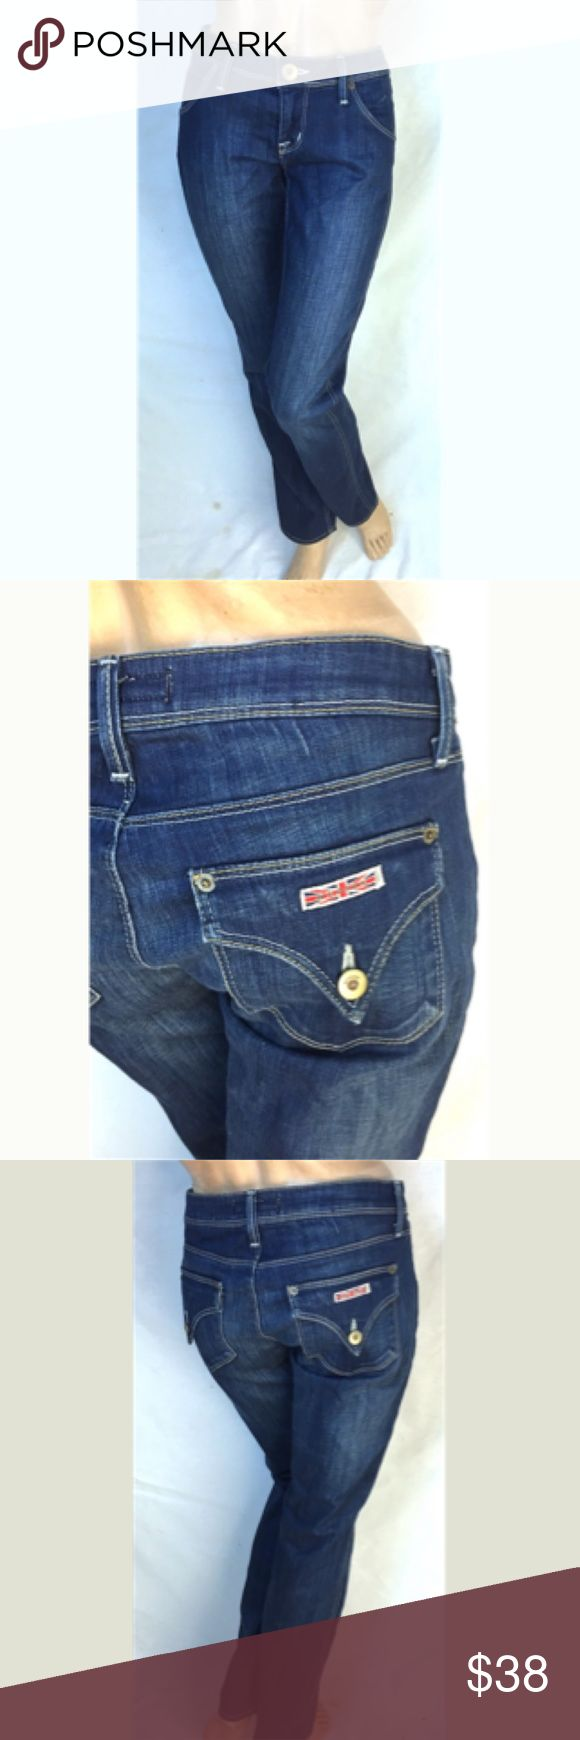 Hudson jeans straight leg in cry Sz 28 Hudson jeans straight leg in cry Sz 28 Hudson Jeans Jeans Straight Leg